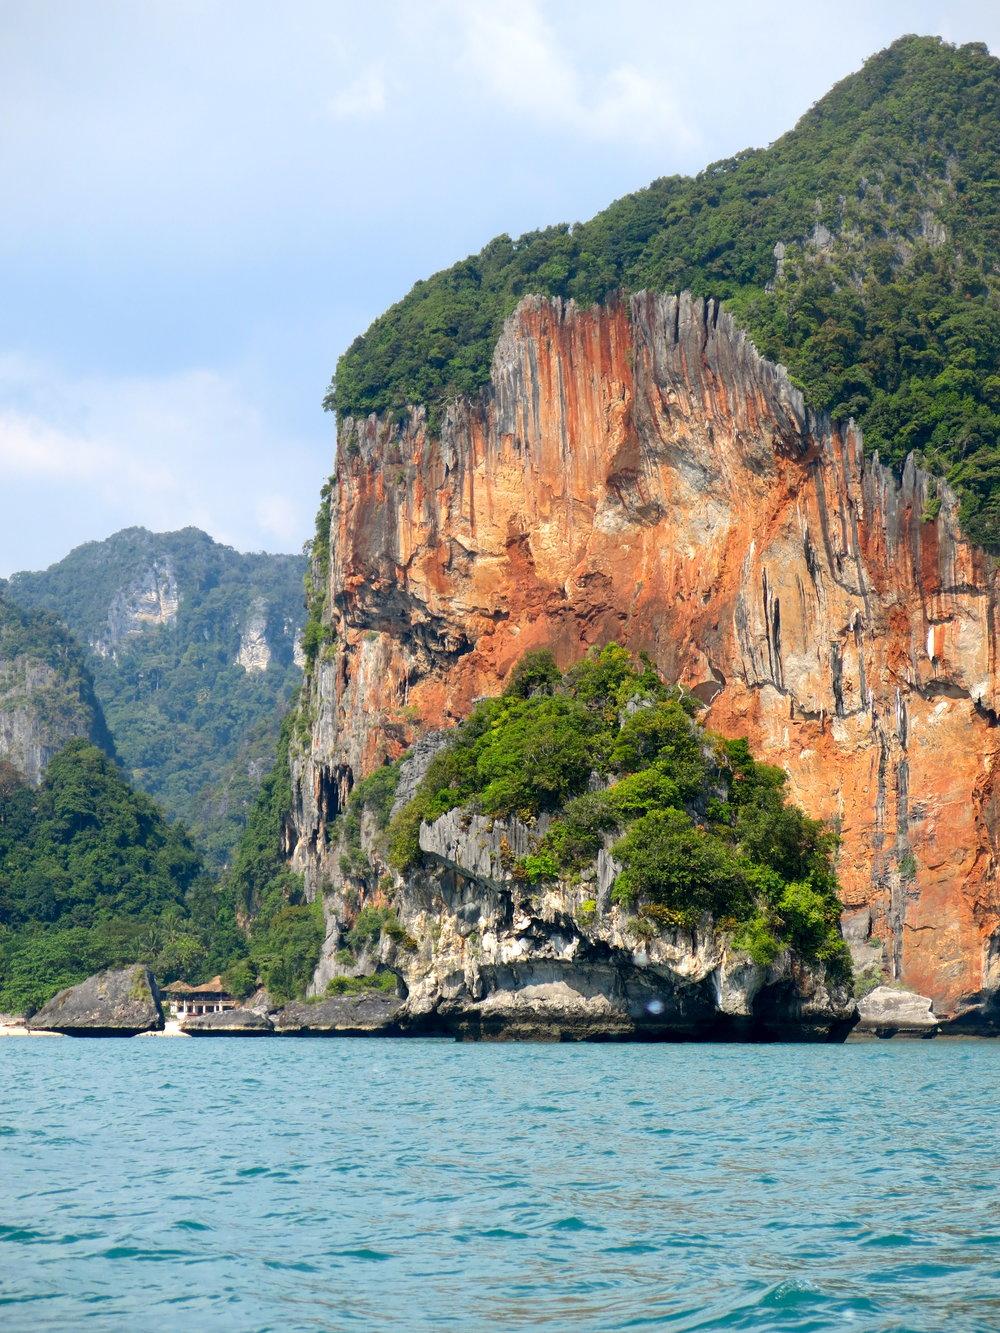 Sailing past the red cliffs near Ao Phra Nang Beach